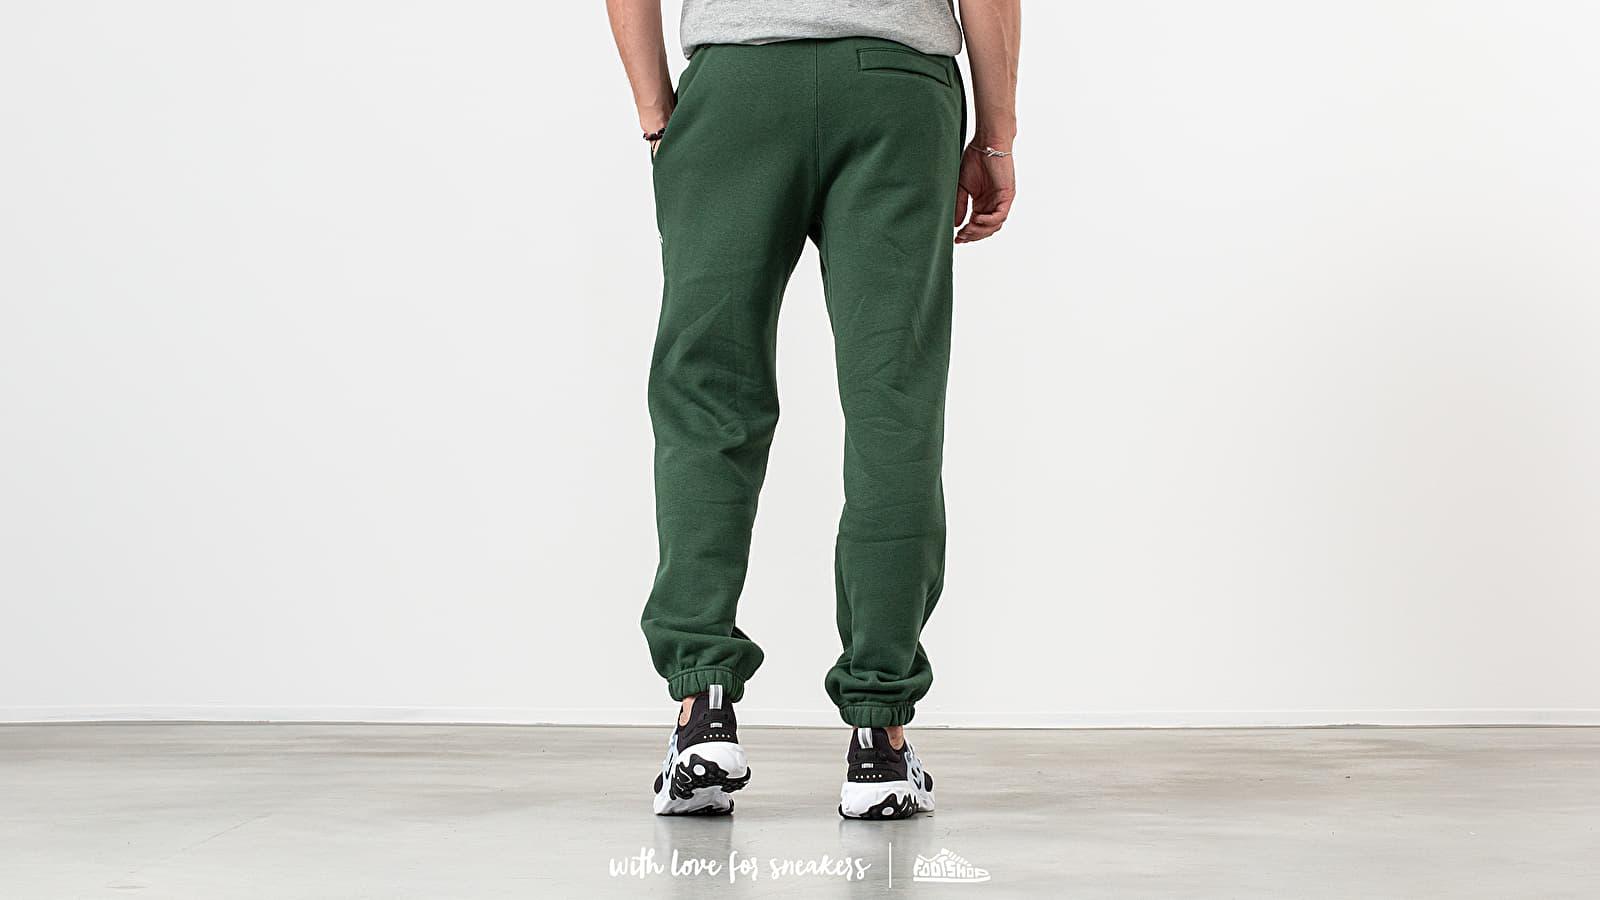 e80a348c Nike x Stranger Things NRG Club Pants Fir/ White/ Sail at a great price